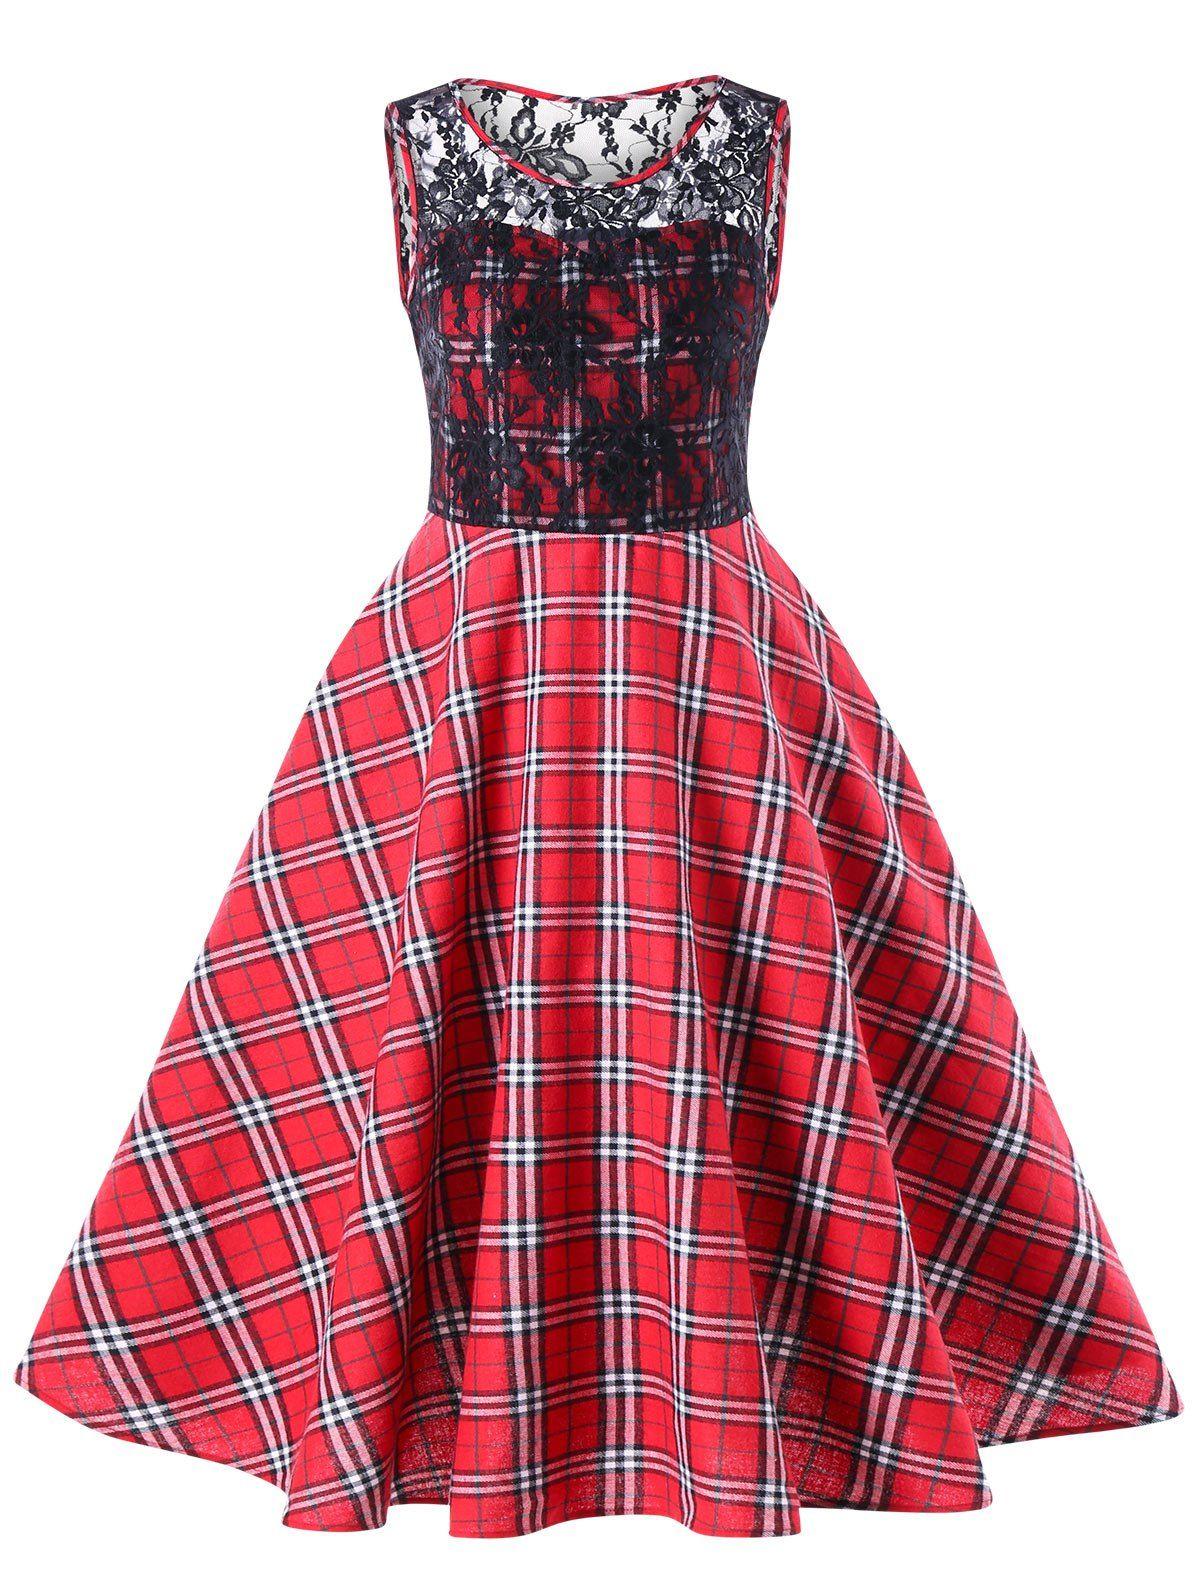 Lace Trim Plaid 50s Swing Dress   SammyDresses   Pinterest